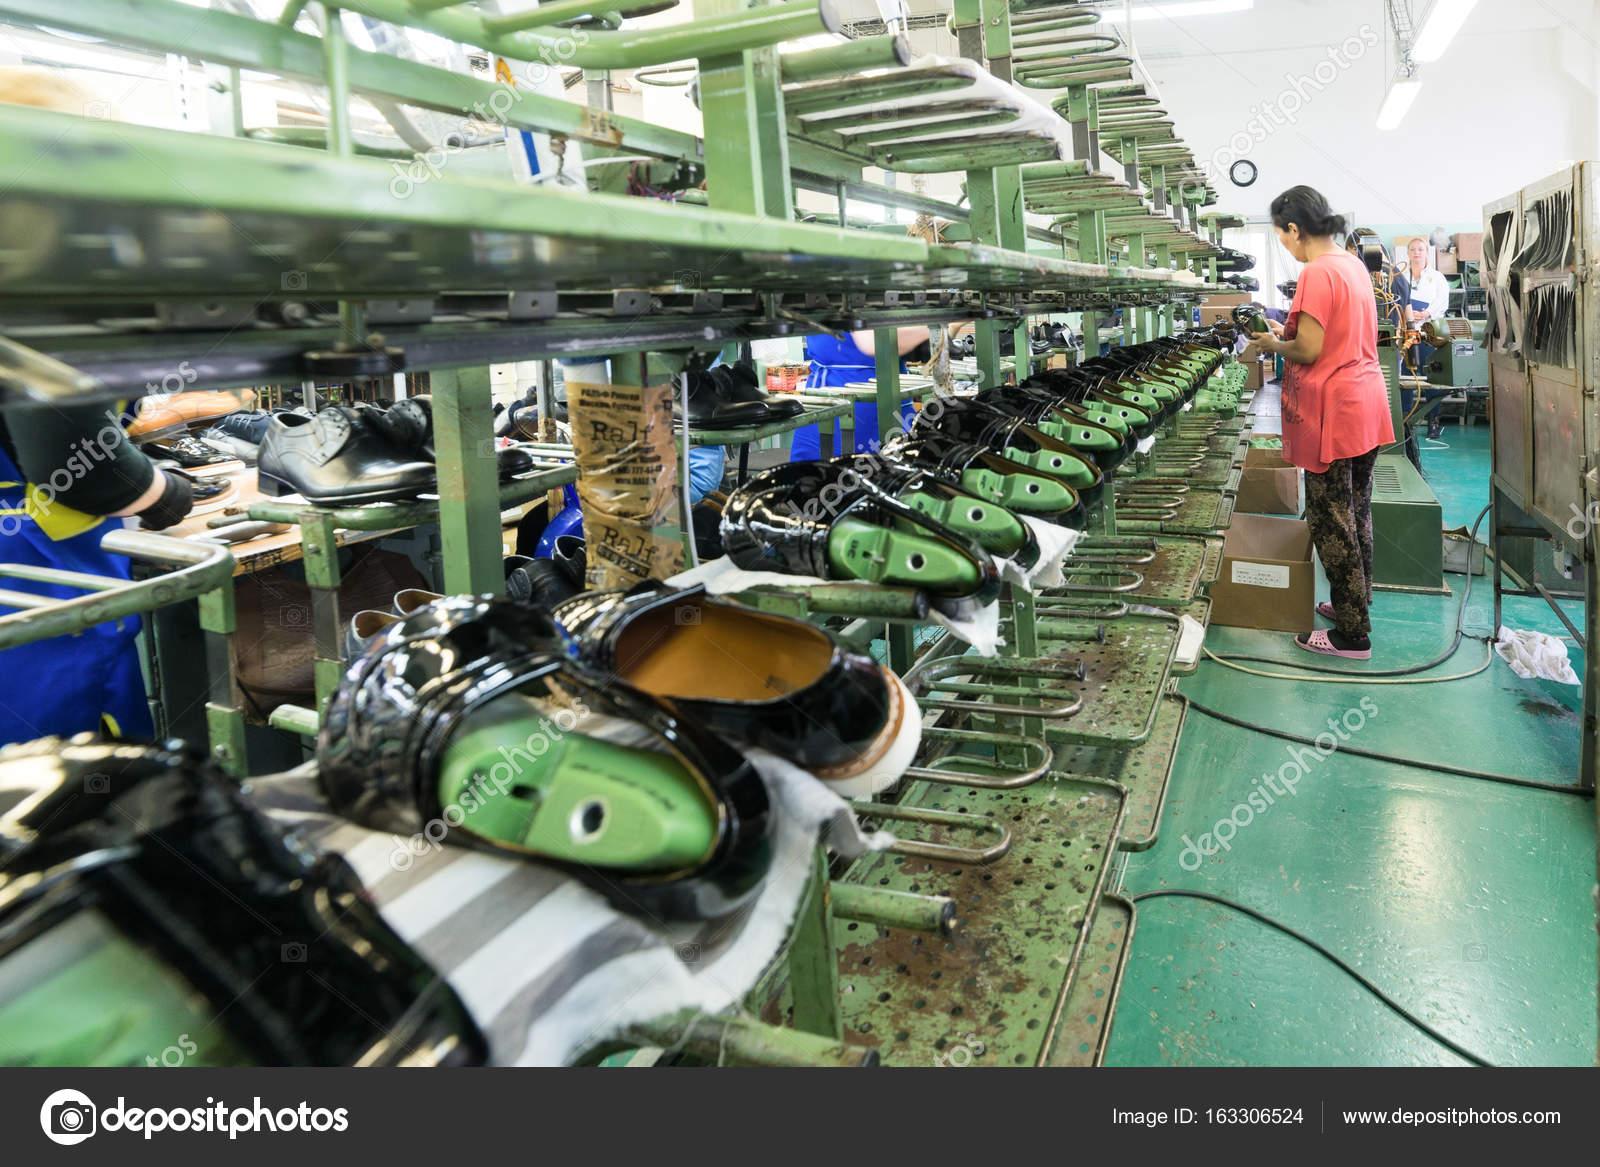 e3166e3e76 Moscou, Rússia - 21 de fevereiro de 2017: Fábrica de sapatos de Moscou Jsc  Ralf Ringer. Sapatos na esteira da fábrica da sapata. — Foto de Nordroden